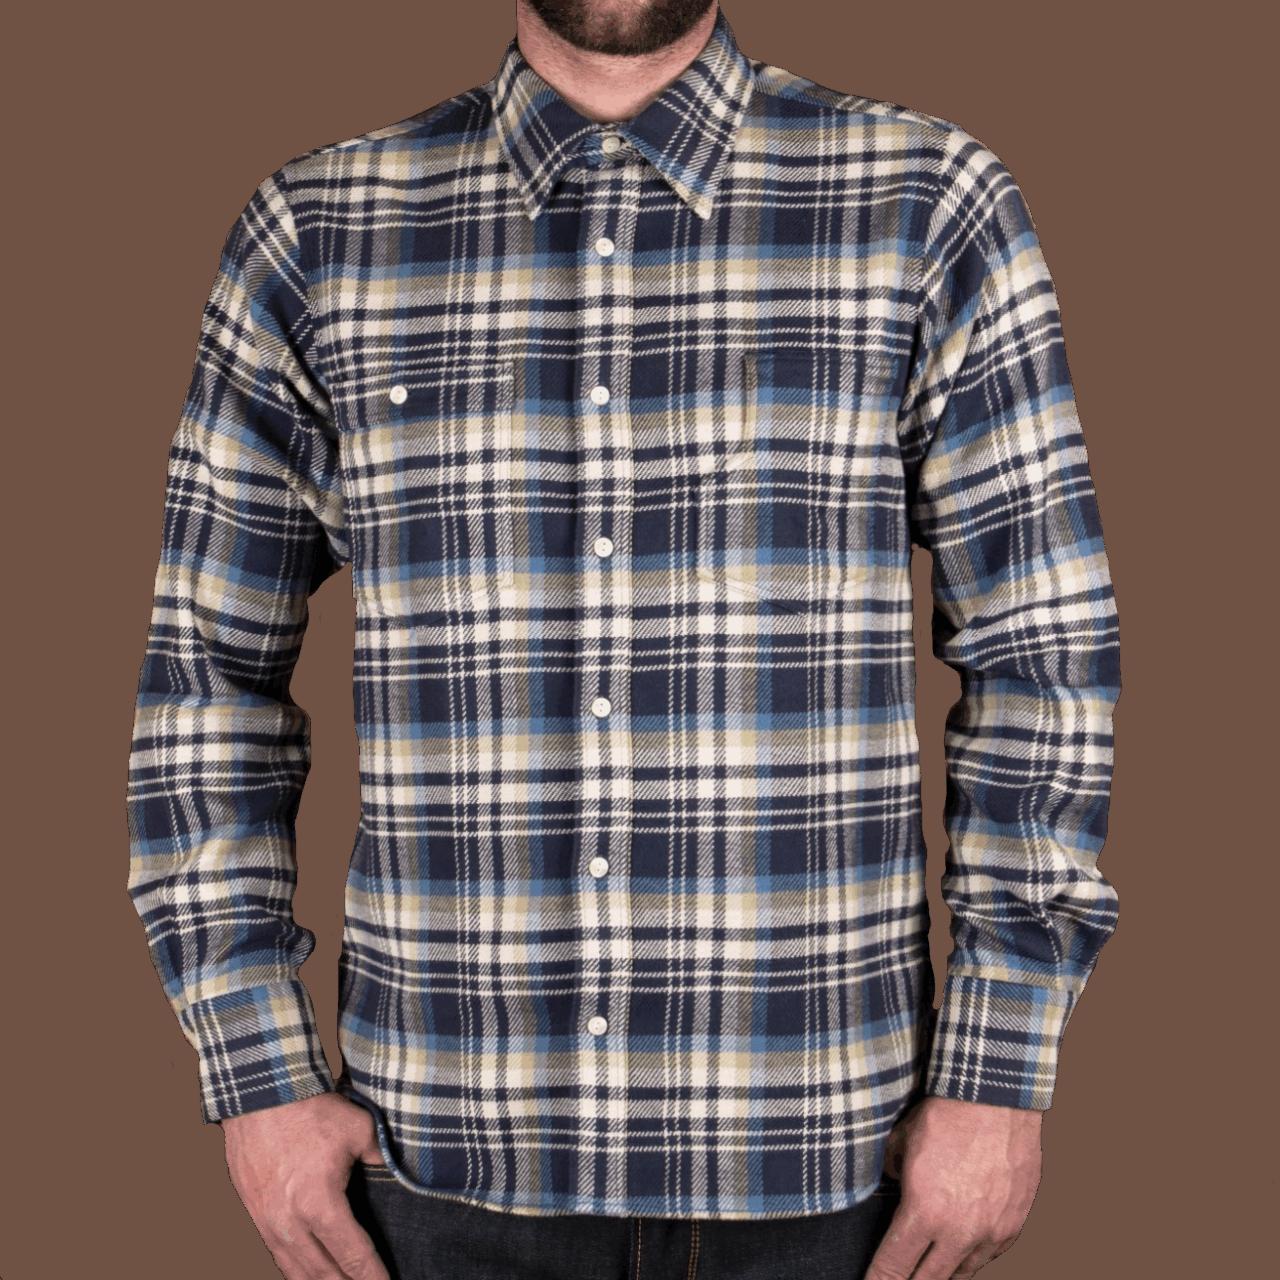 Pike Brothers 1937 Roamer Shirt Dark Blue Flanel